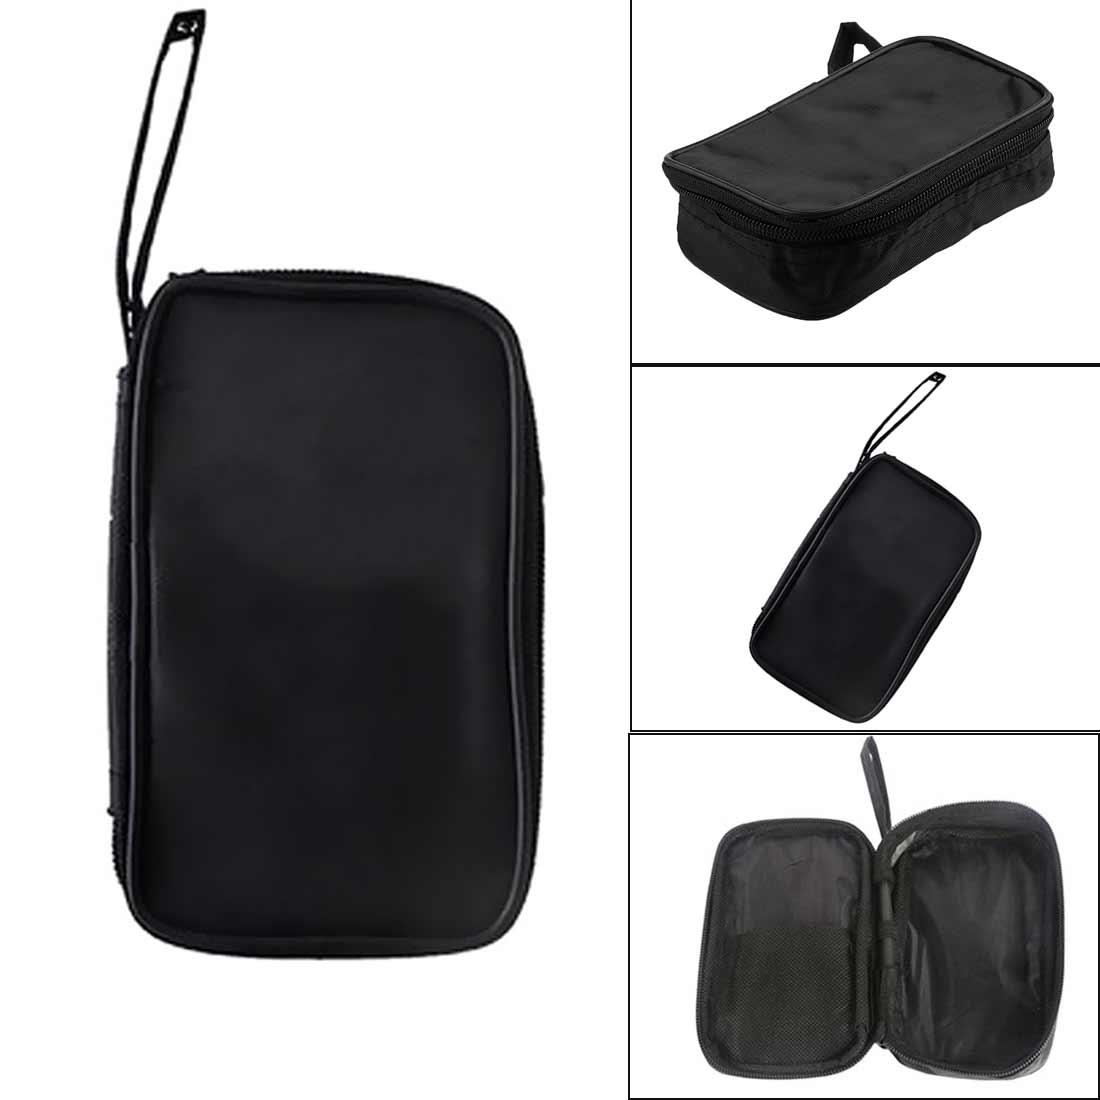 Multimeter Black Colth Bag 23*14*5cm UT Durable Waterproof Shockproof Soft Case for multimeter